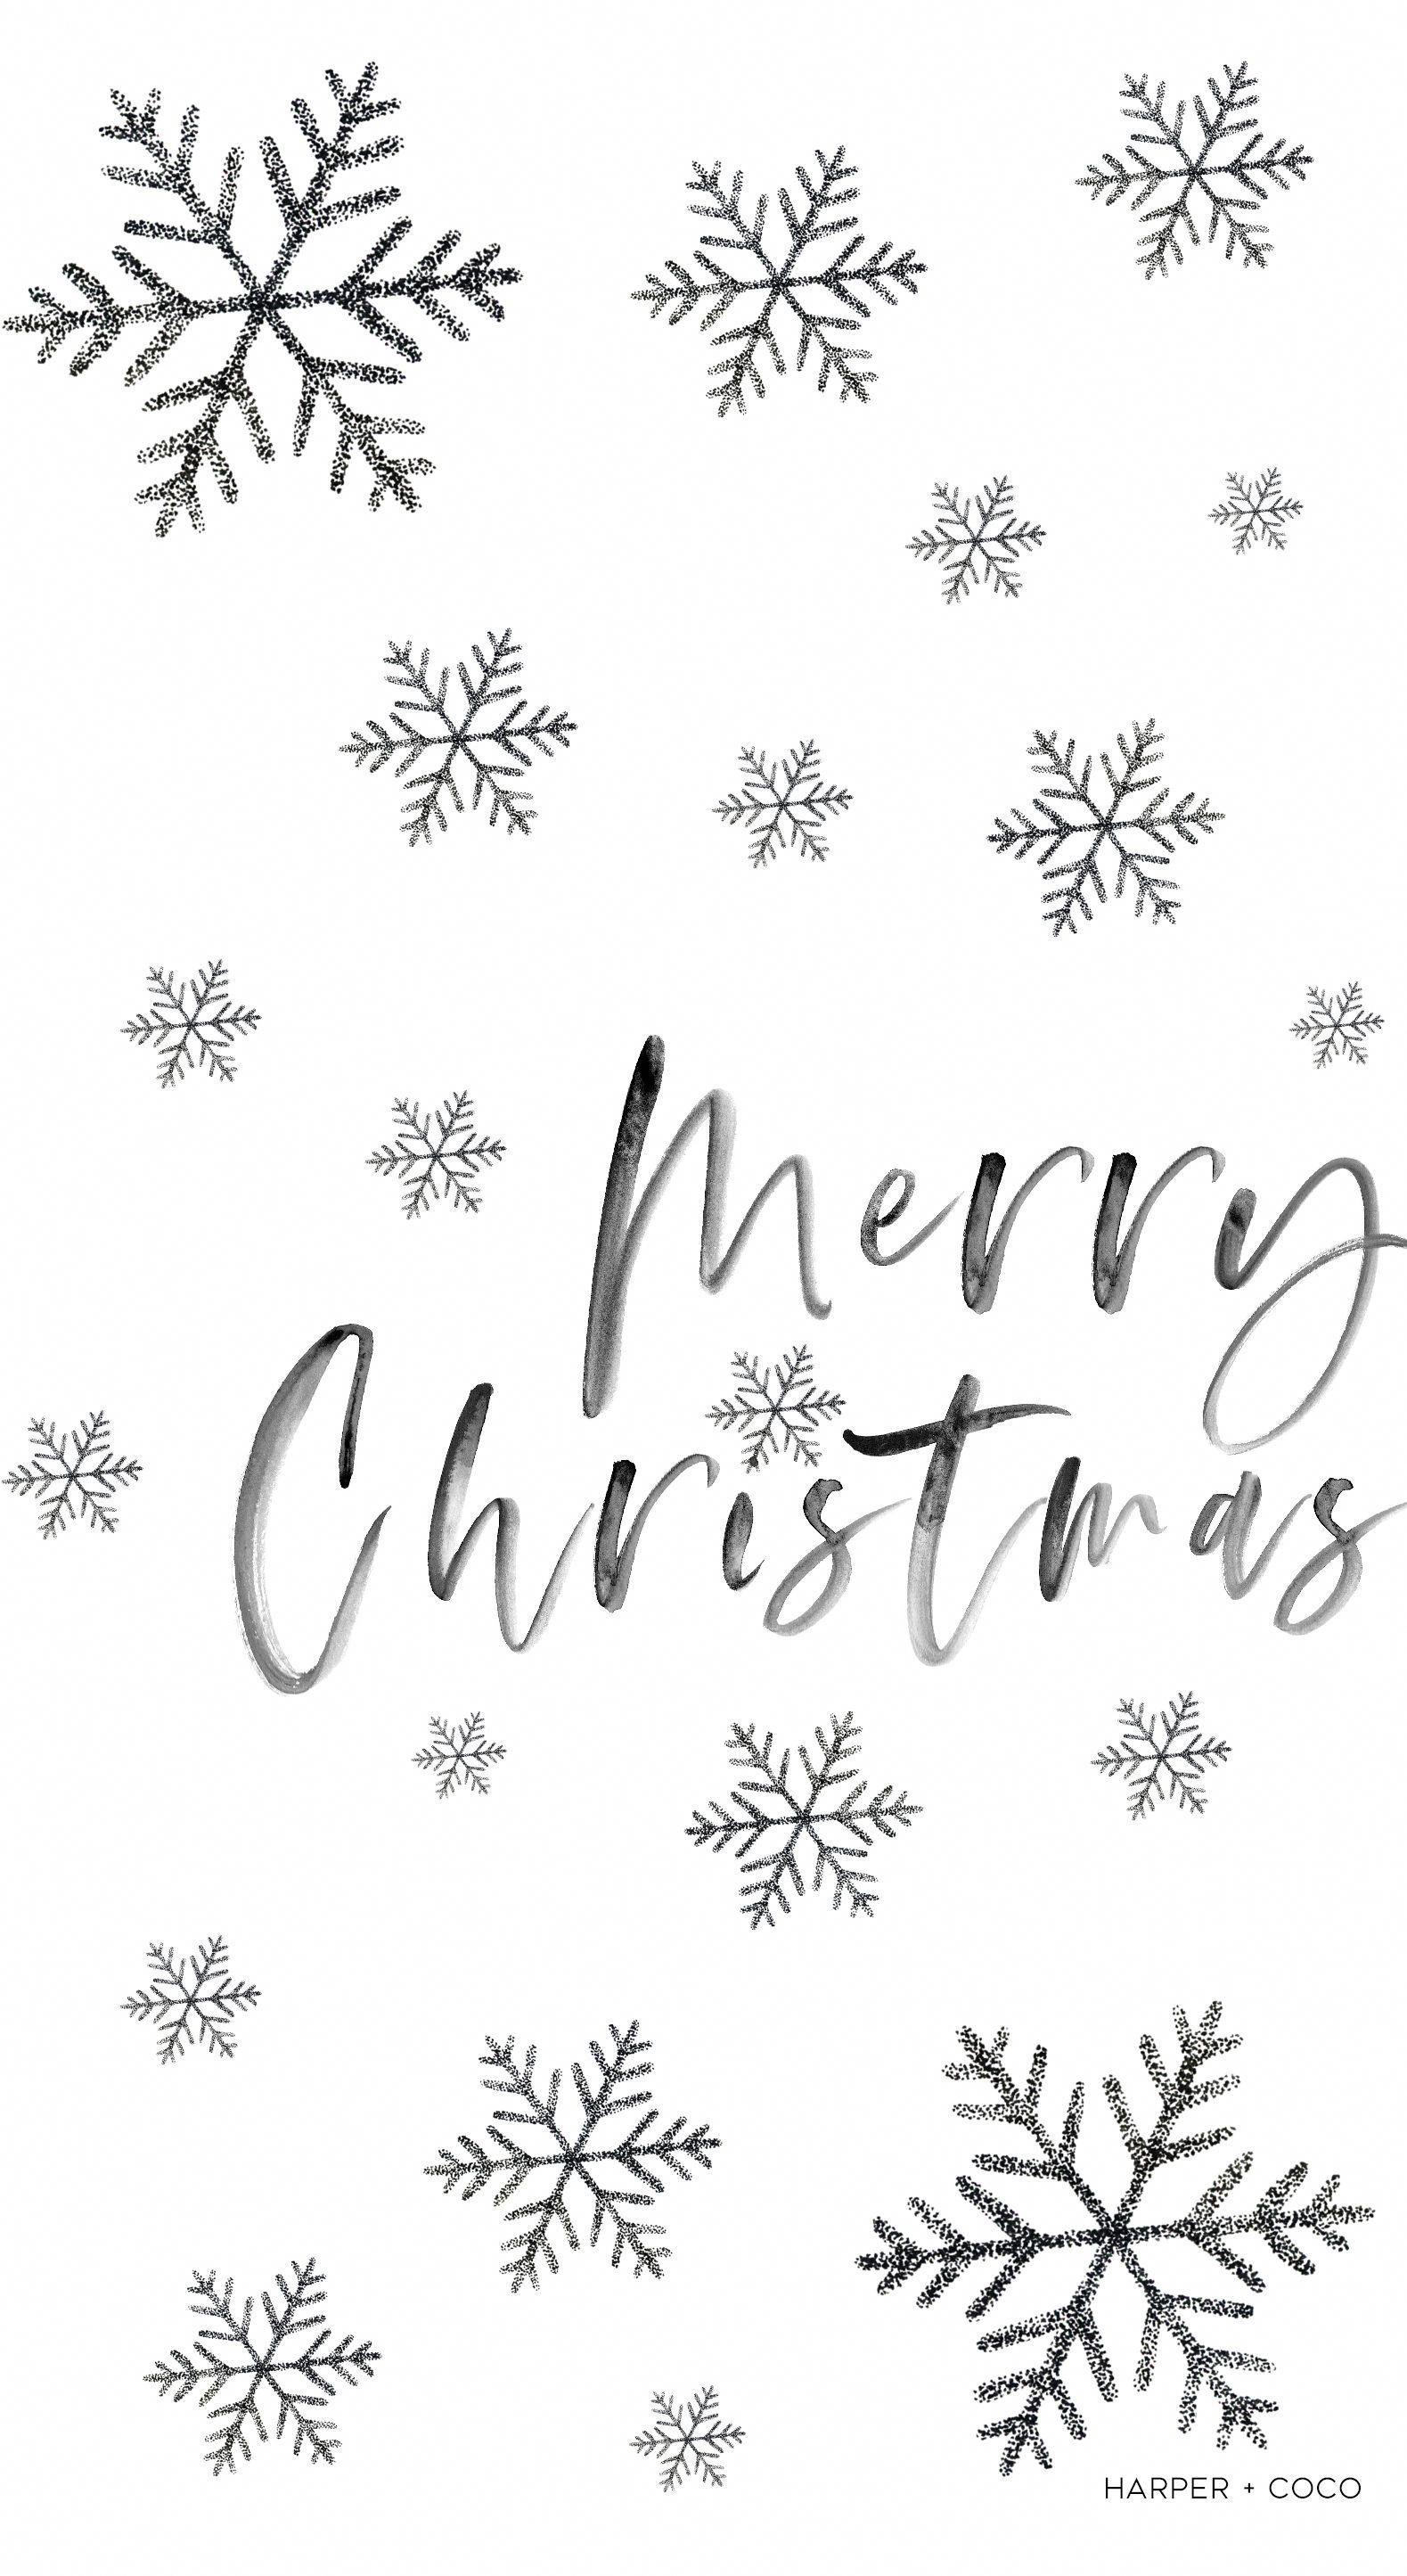 White Christmas Hd Wallpaper Hd Wallpapers Christmas Facebook Cover Christmas Desktop Wallpaper Christmas Tree Wallpaper